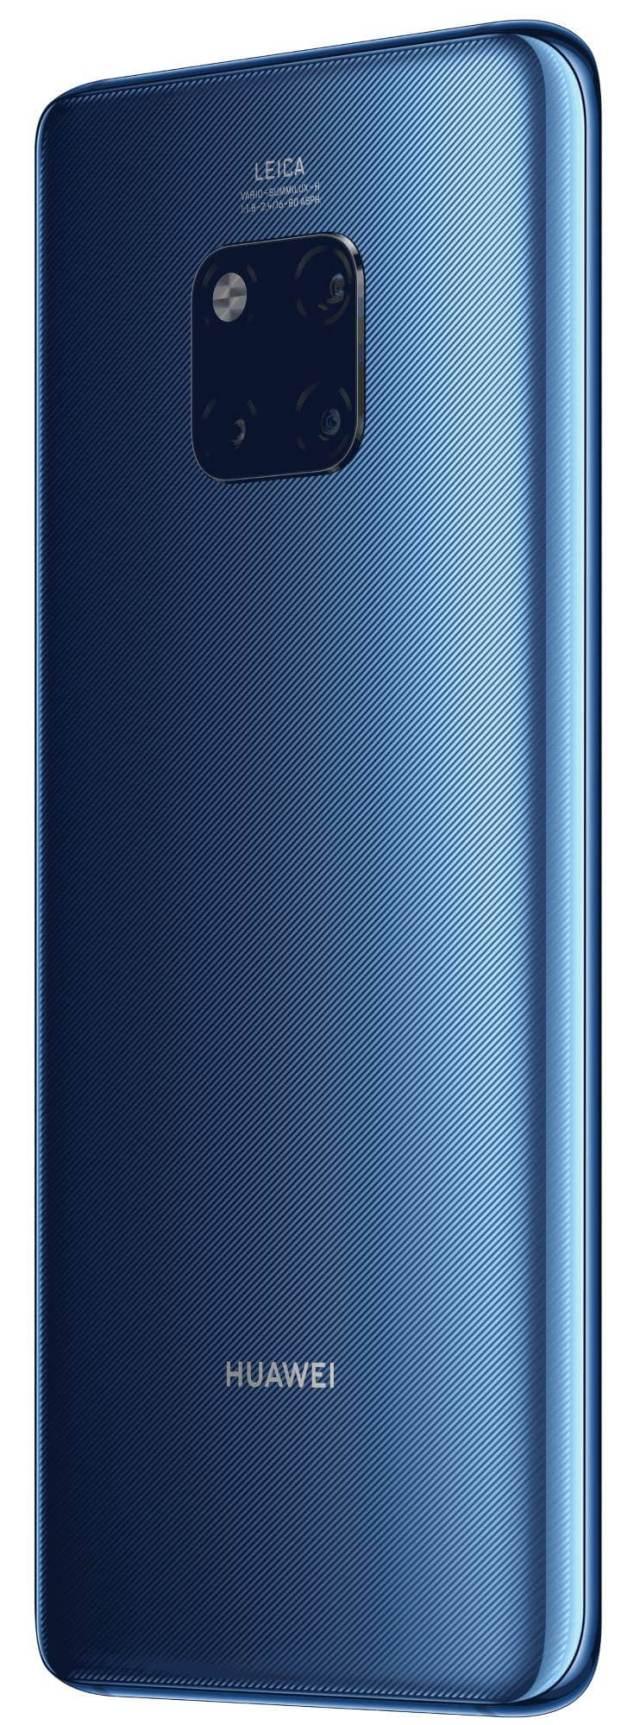 Huawei presenta Mate 20 Series 4